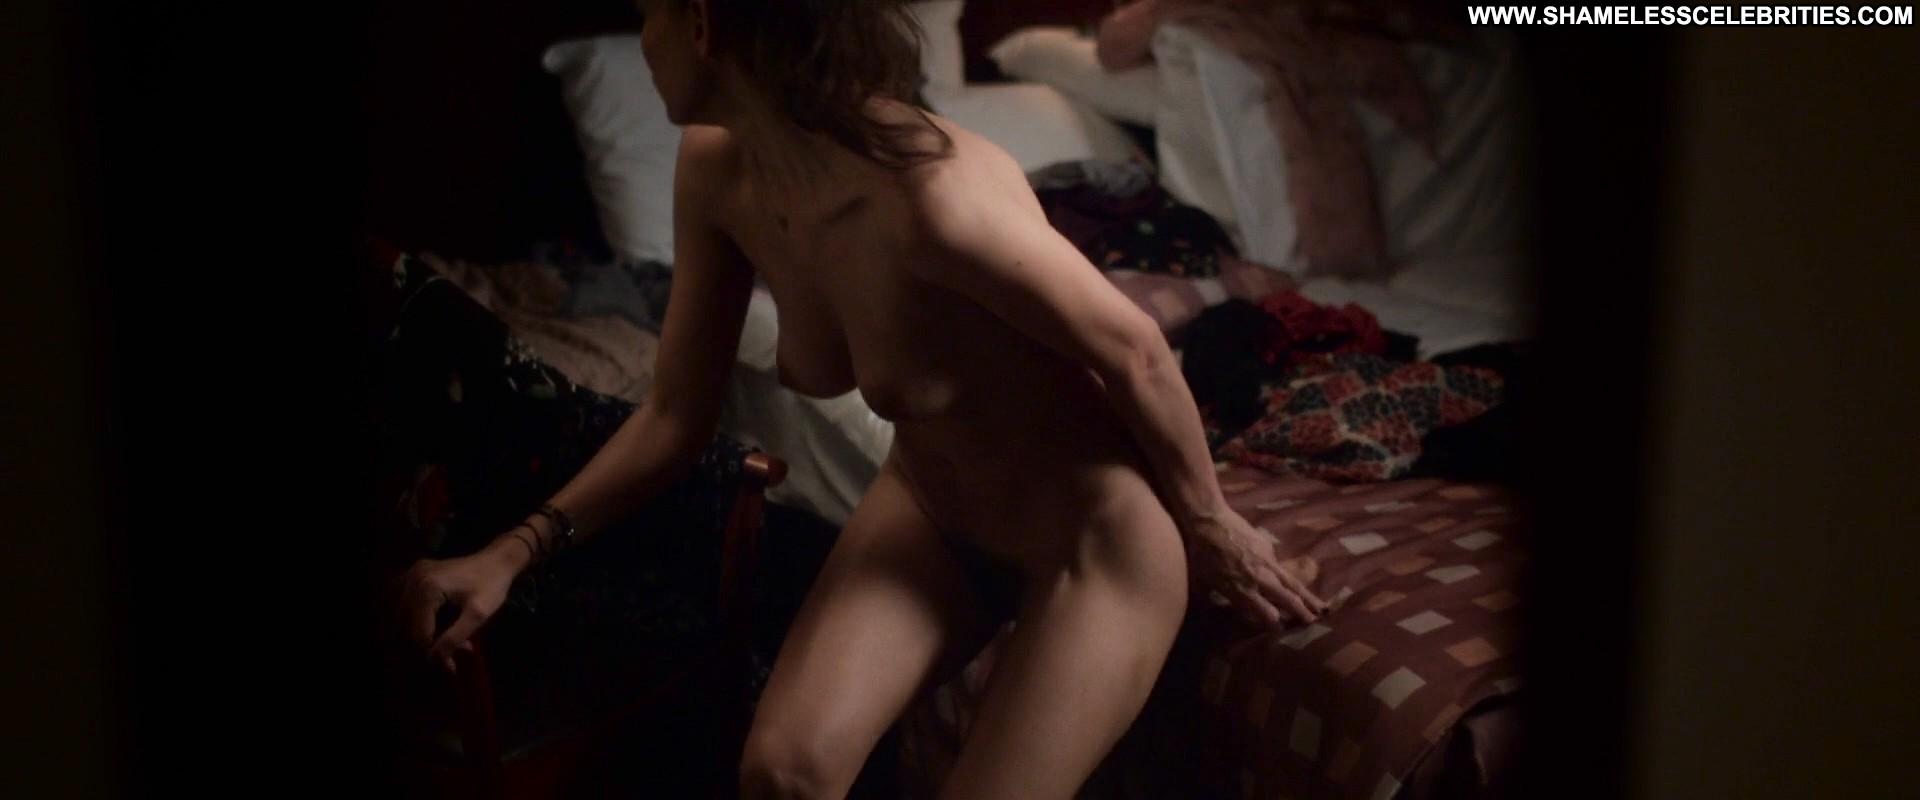 Ariadna Gil Nude Topless And Elena Anaya Nude Topless And Sex